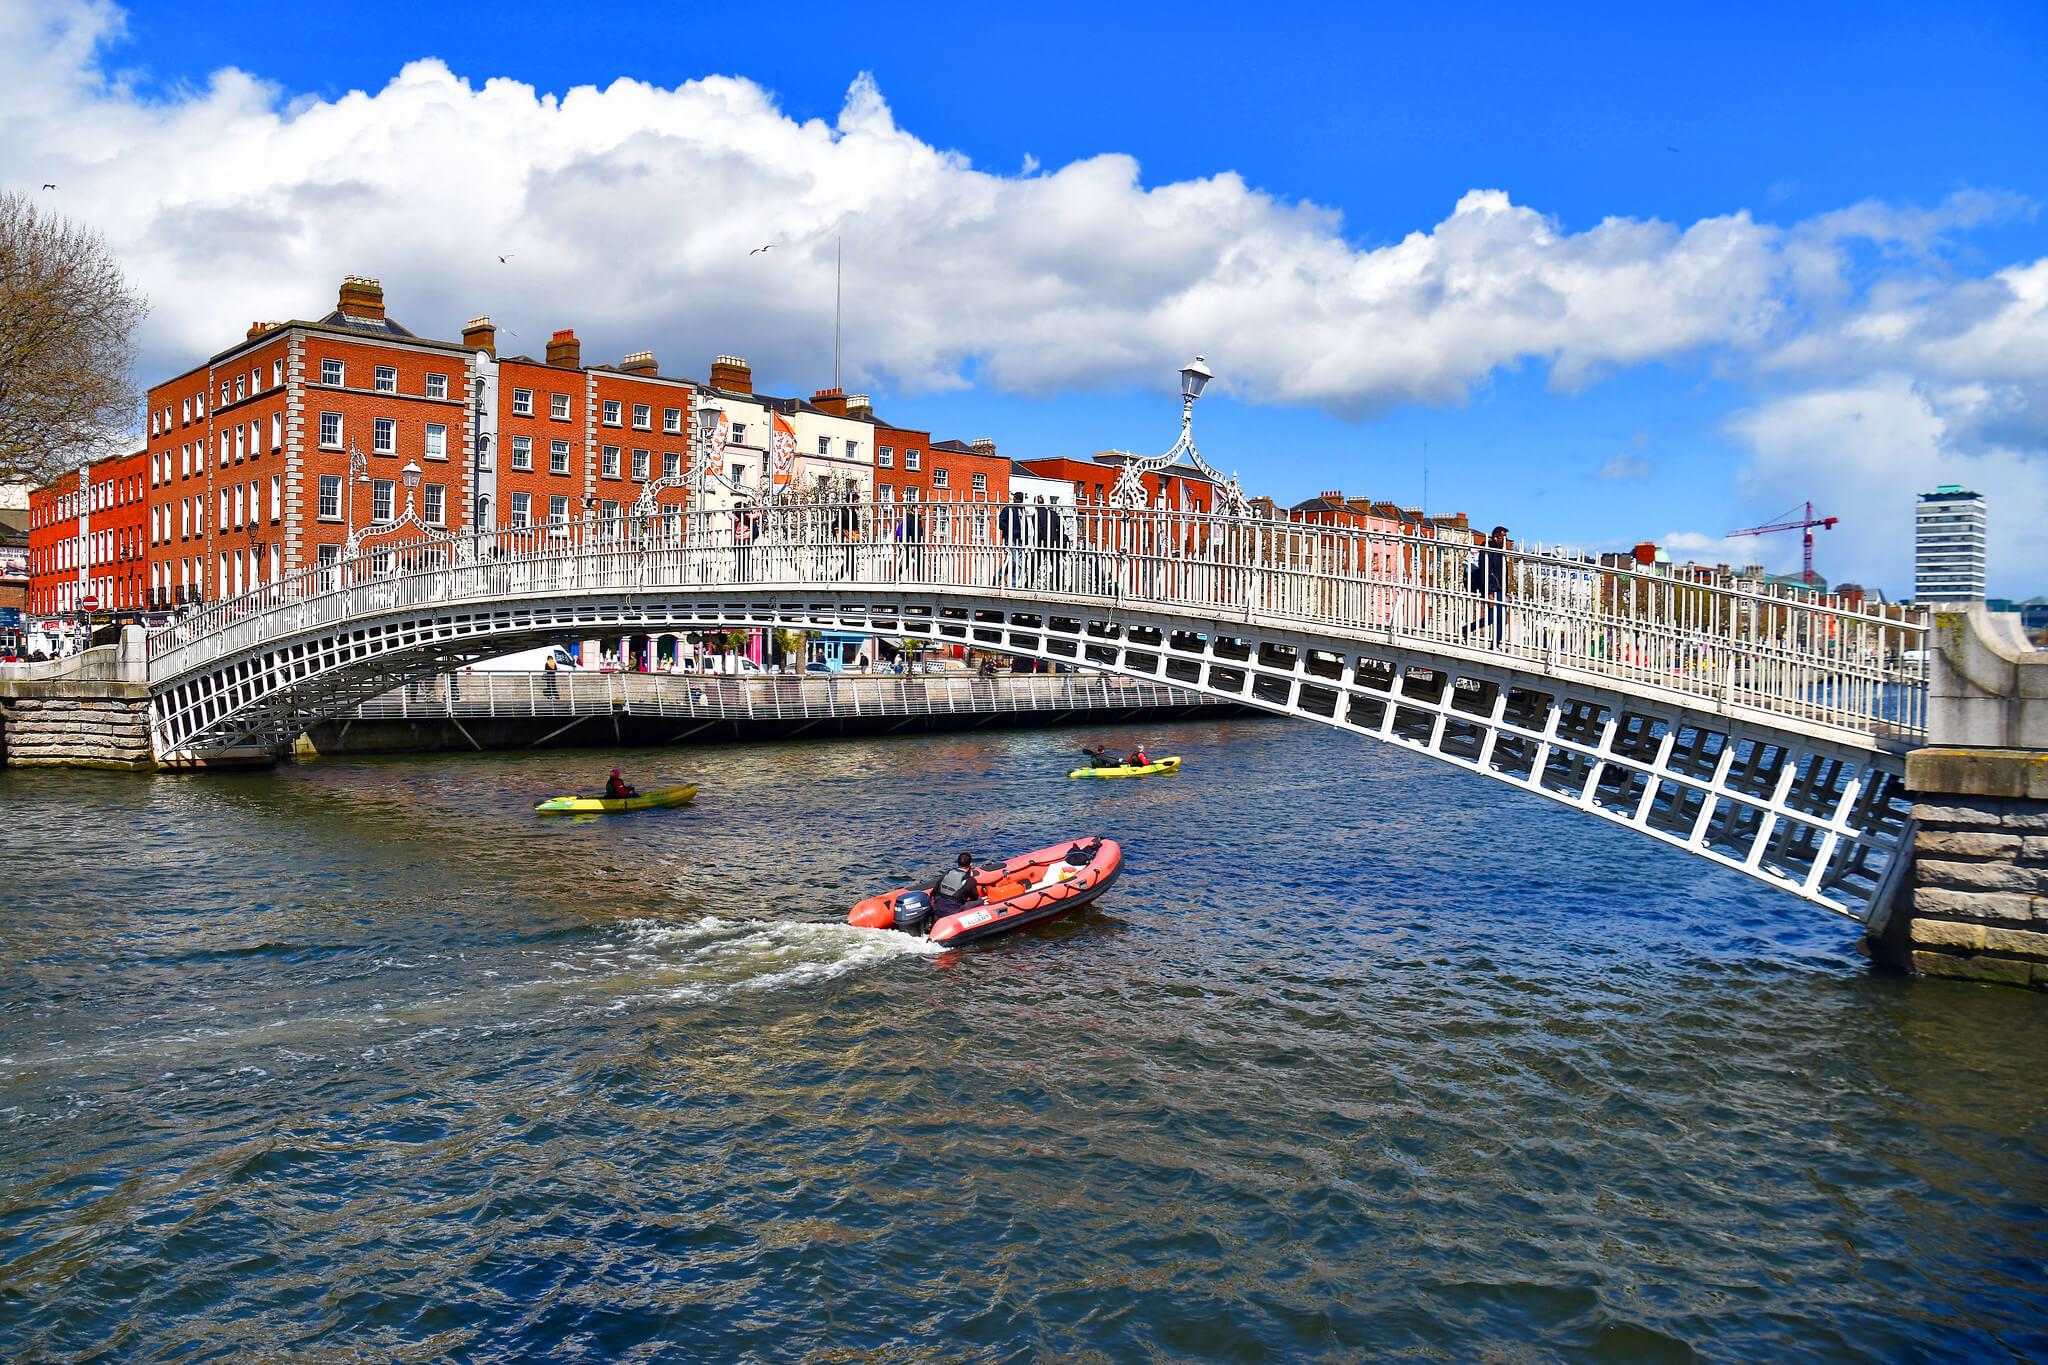 Hapenny Bridge Dublin Ireland - Ron Cogswell (Flickr)